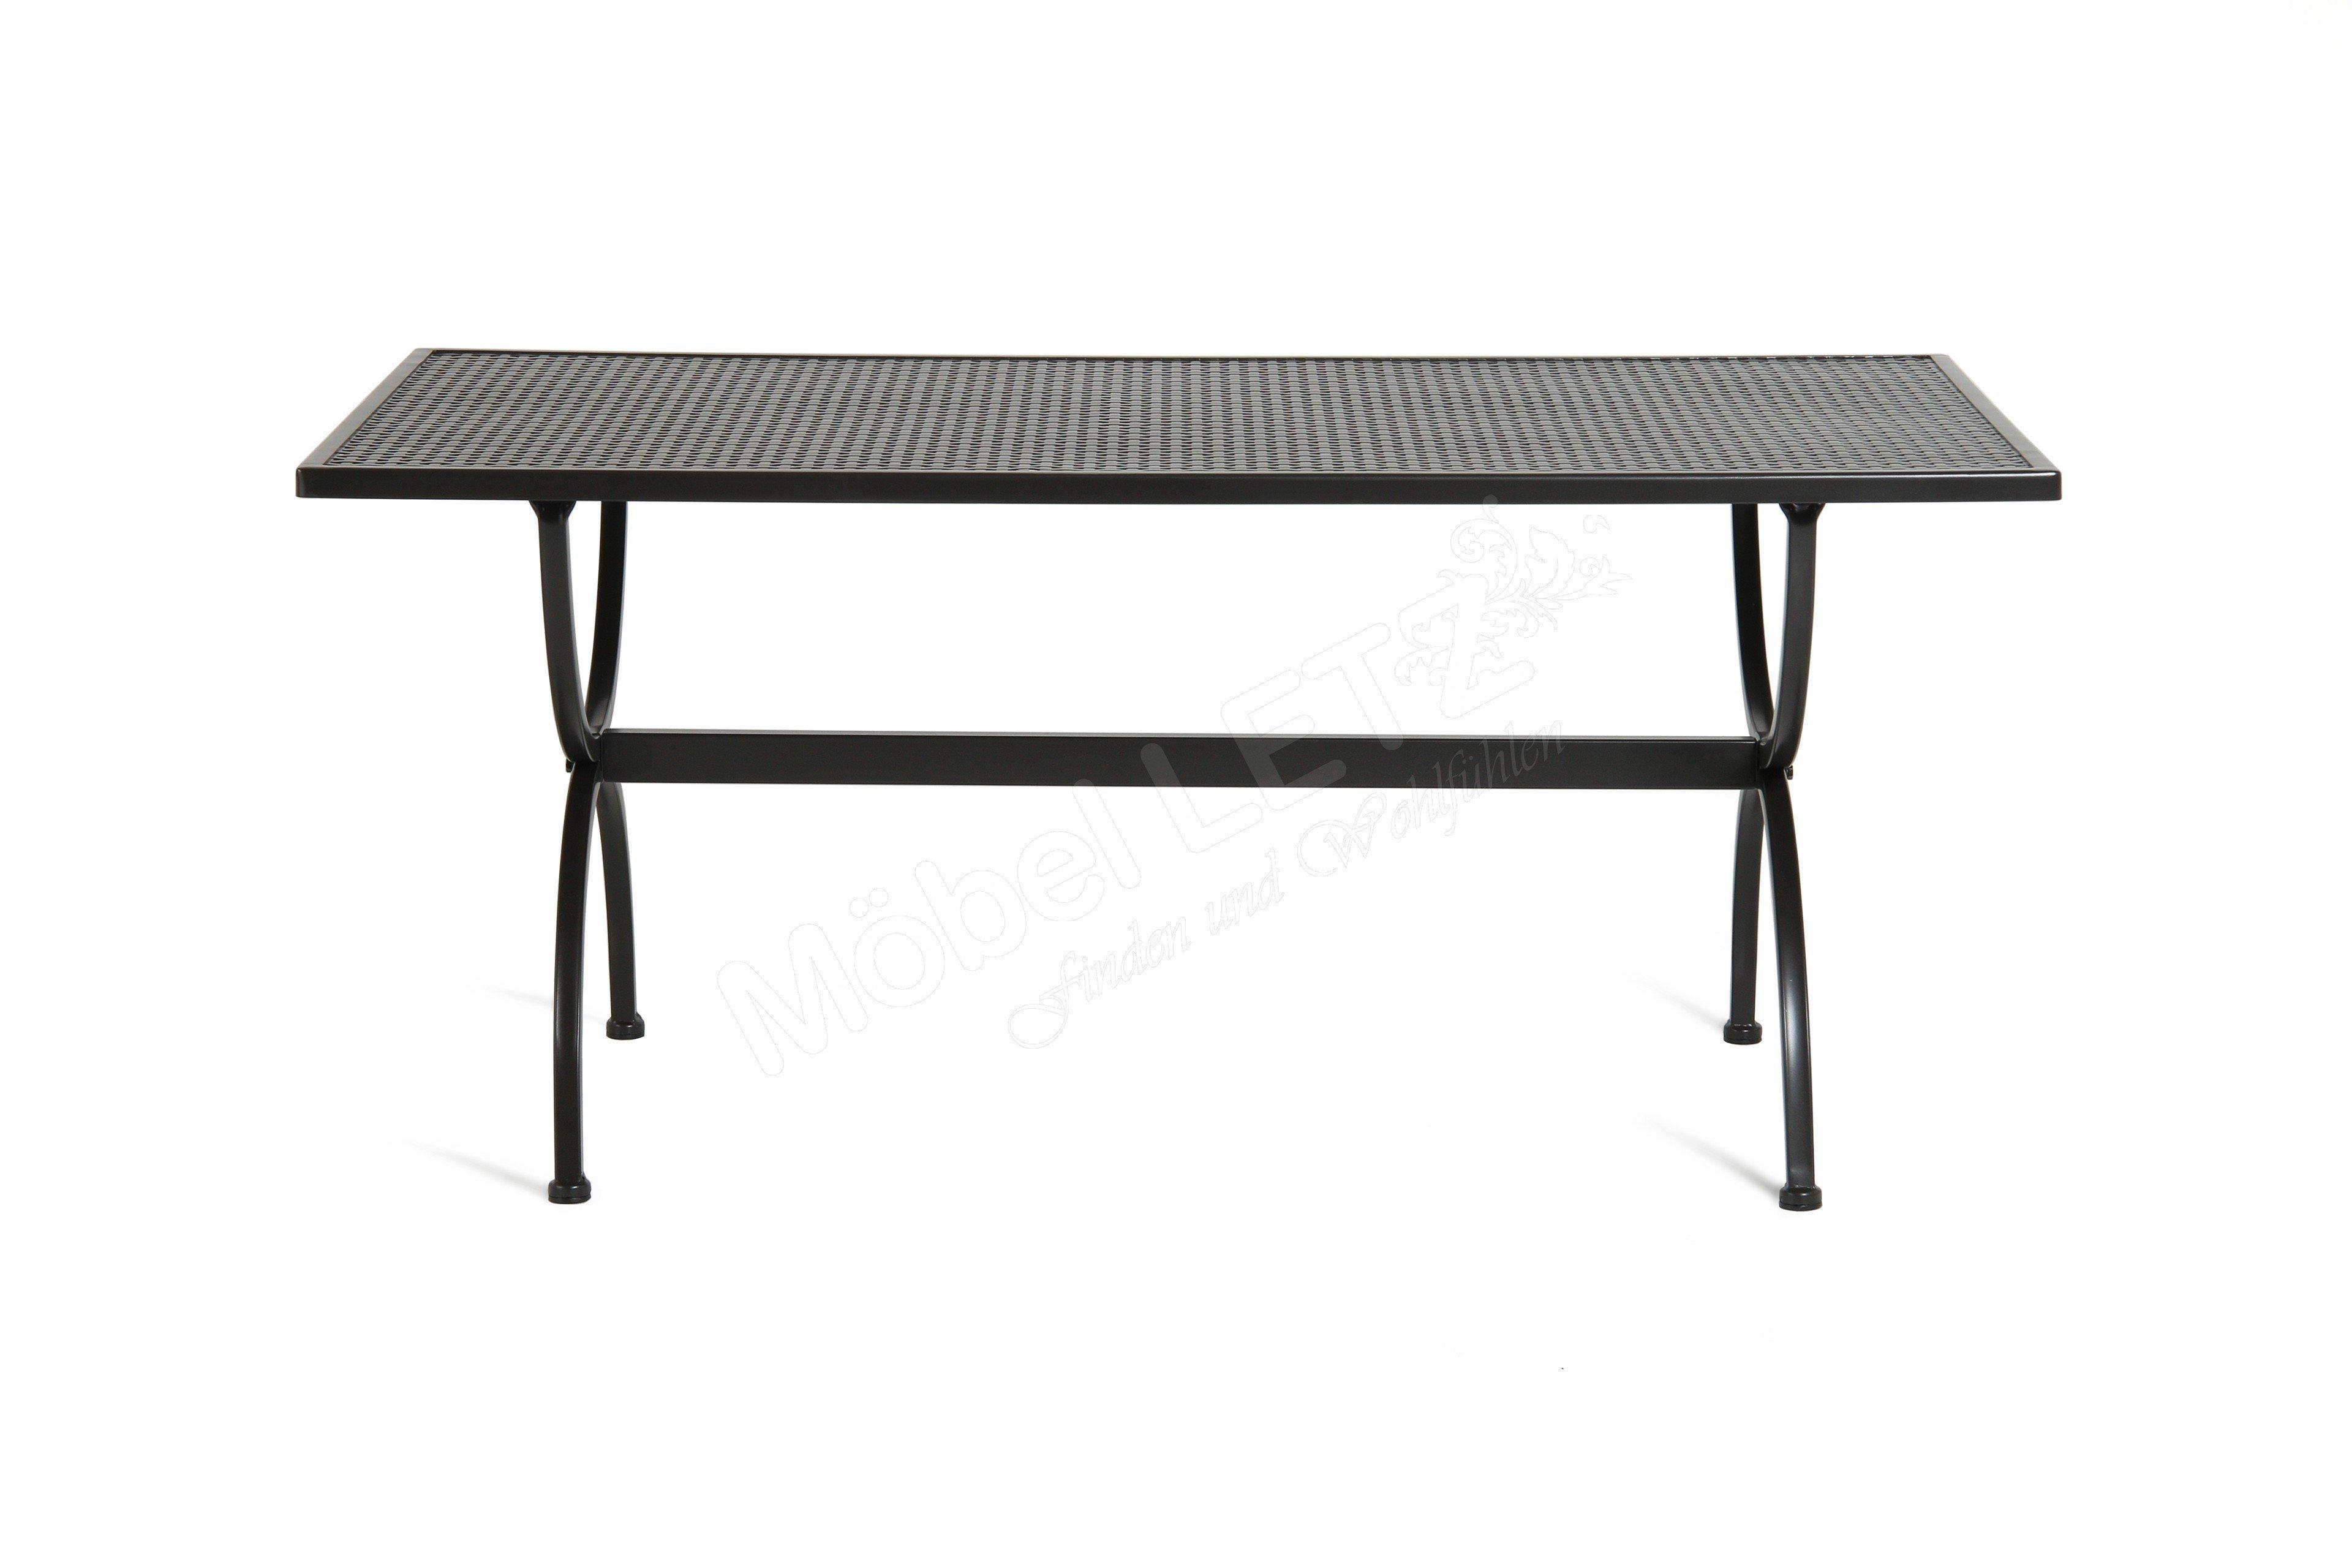 Mbm Tisch Romeo 156 135 Schmiedeeisen Ca 160 X 90 Cm Mobel Letz